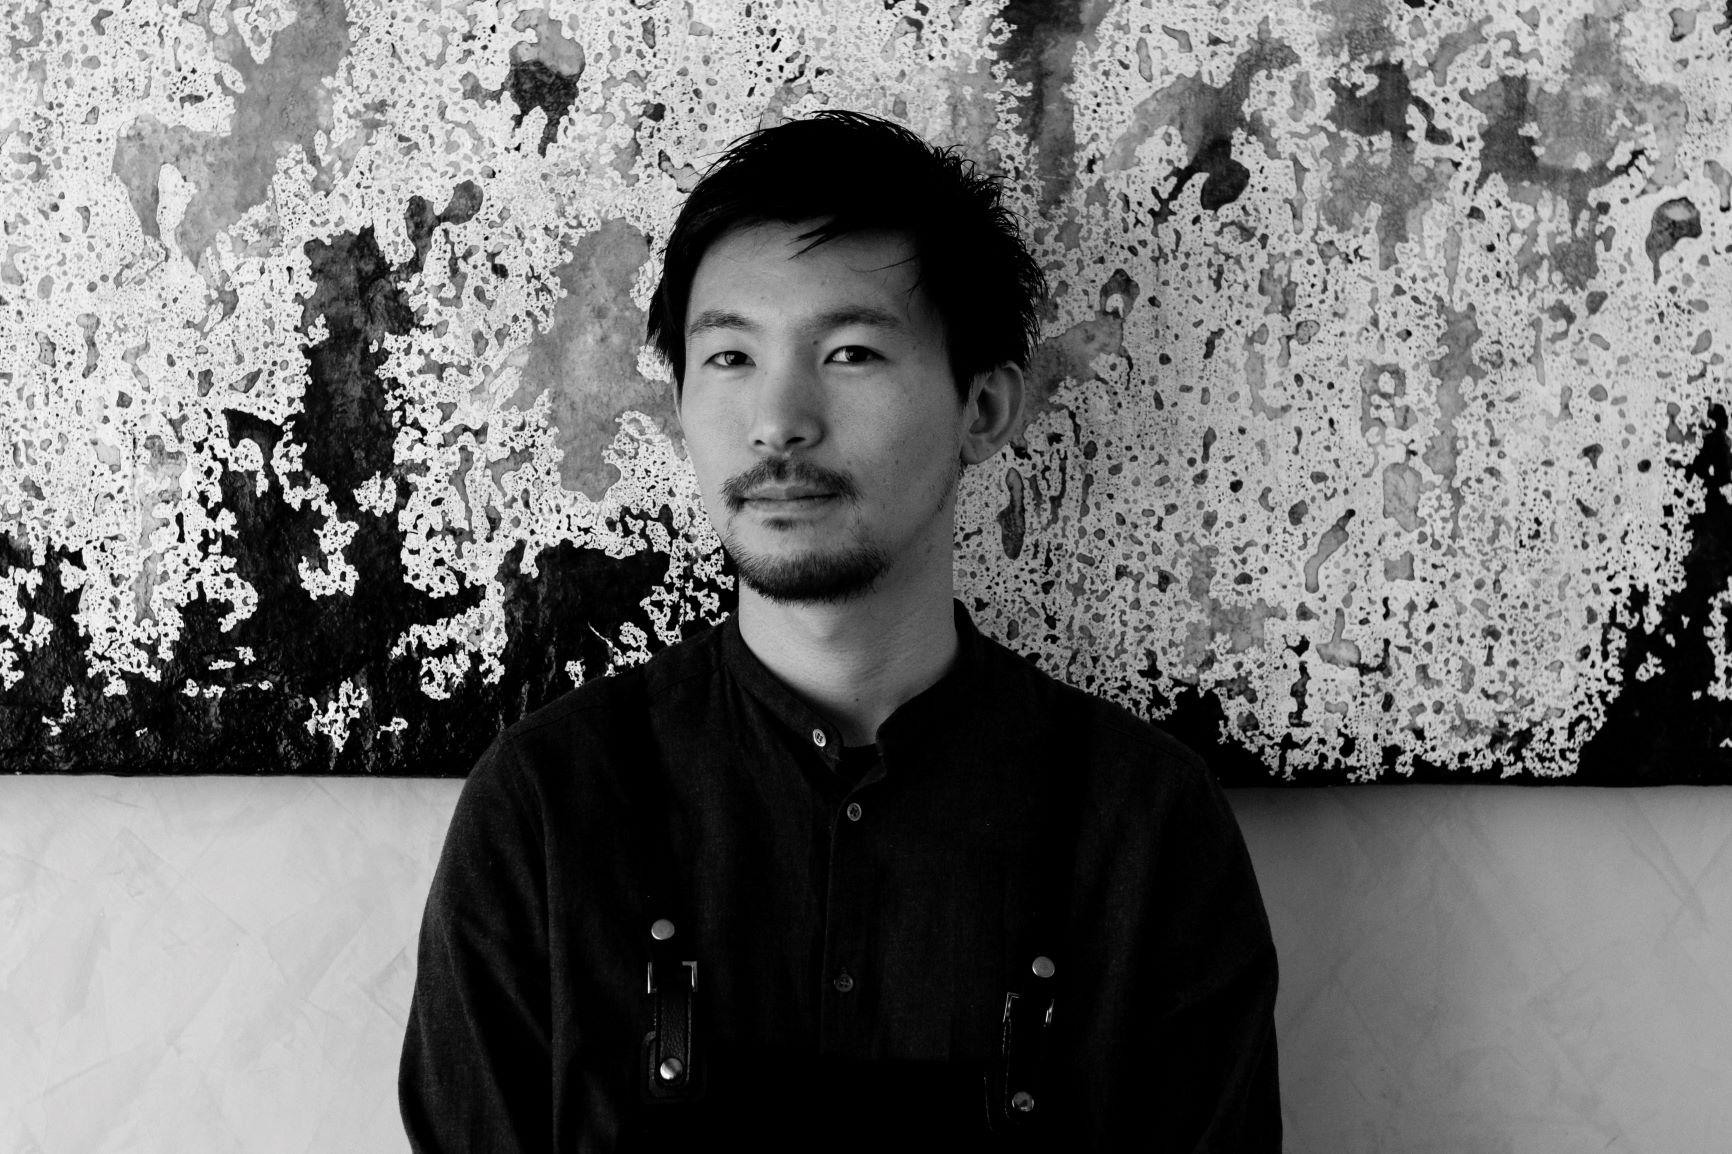 Đầu bếp Ryohei Kawasaki - Passion Week